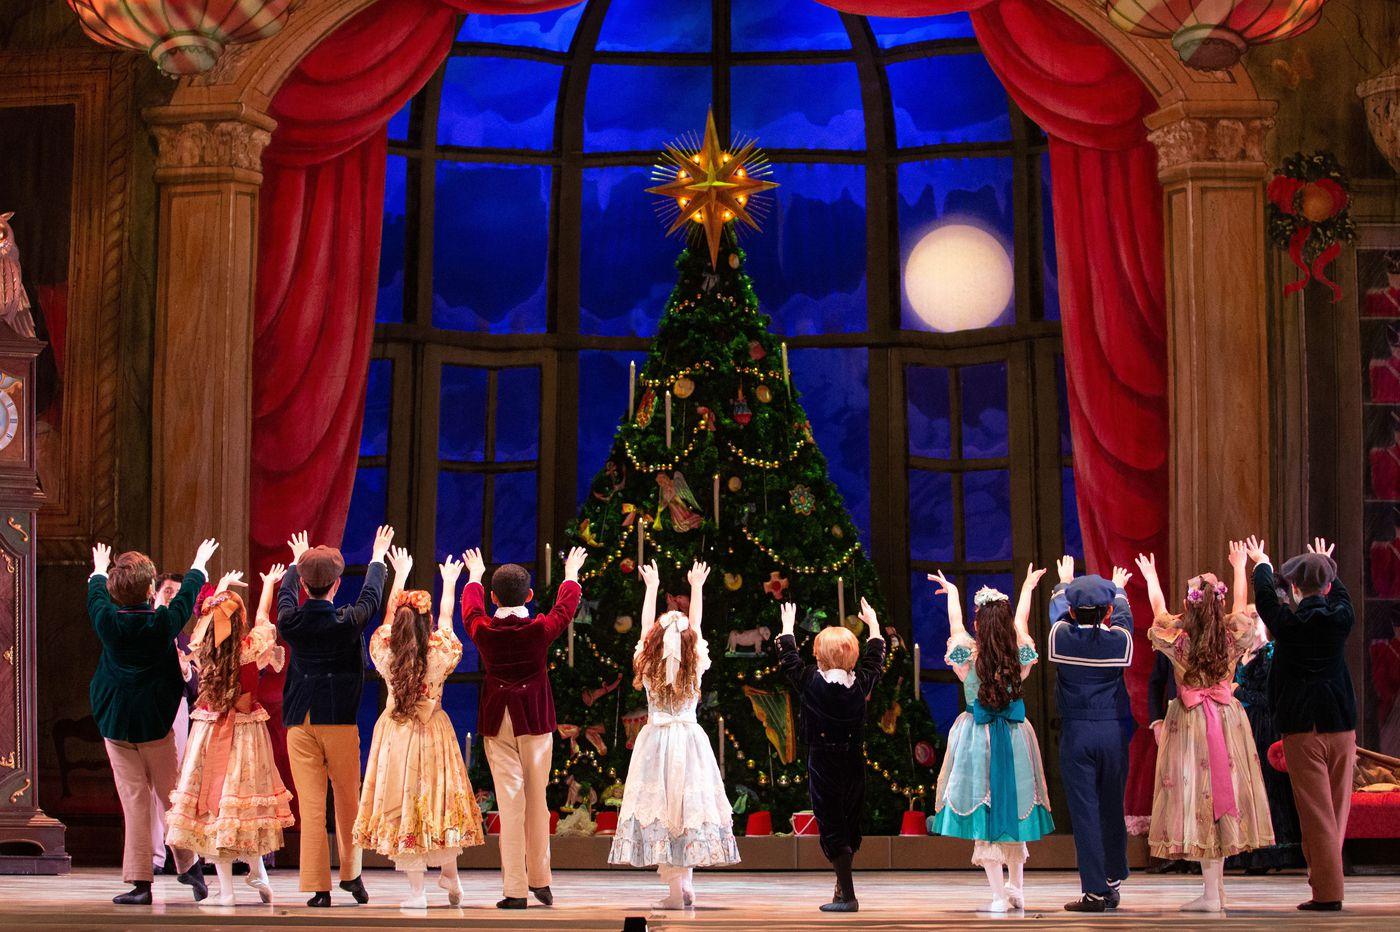 Pennsylvania Ballet's 'Nutcracker' enchants with snow, Sugar Plum, and a sparkling new tree